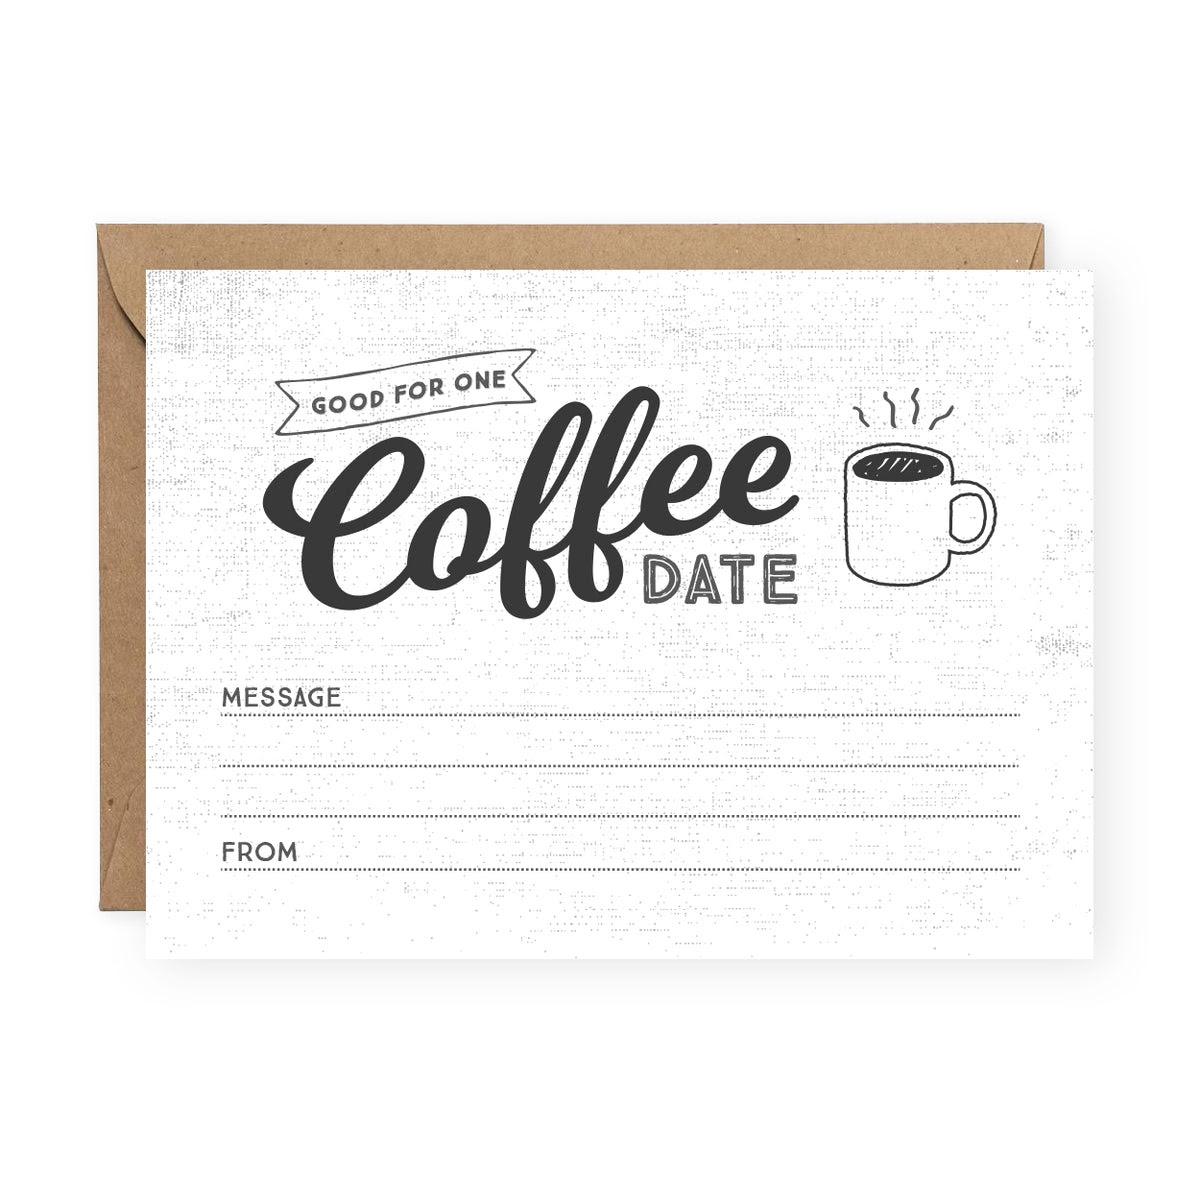 Coffee Date Greeting Card - Friendship Card - The Anastasia Co.